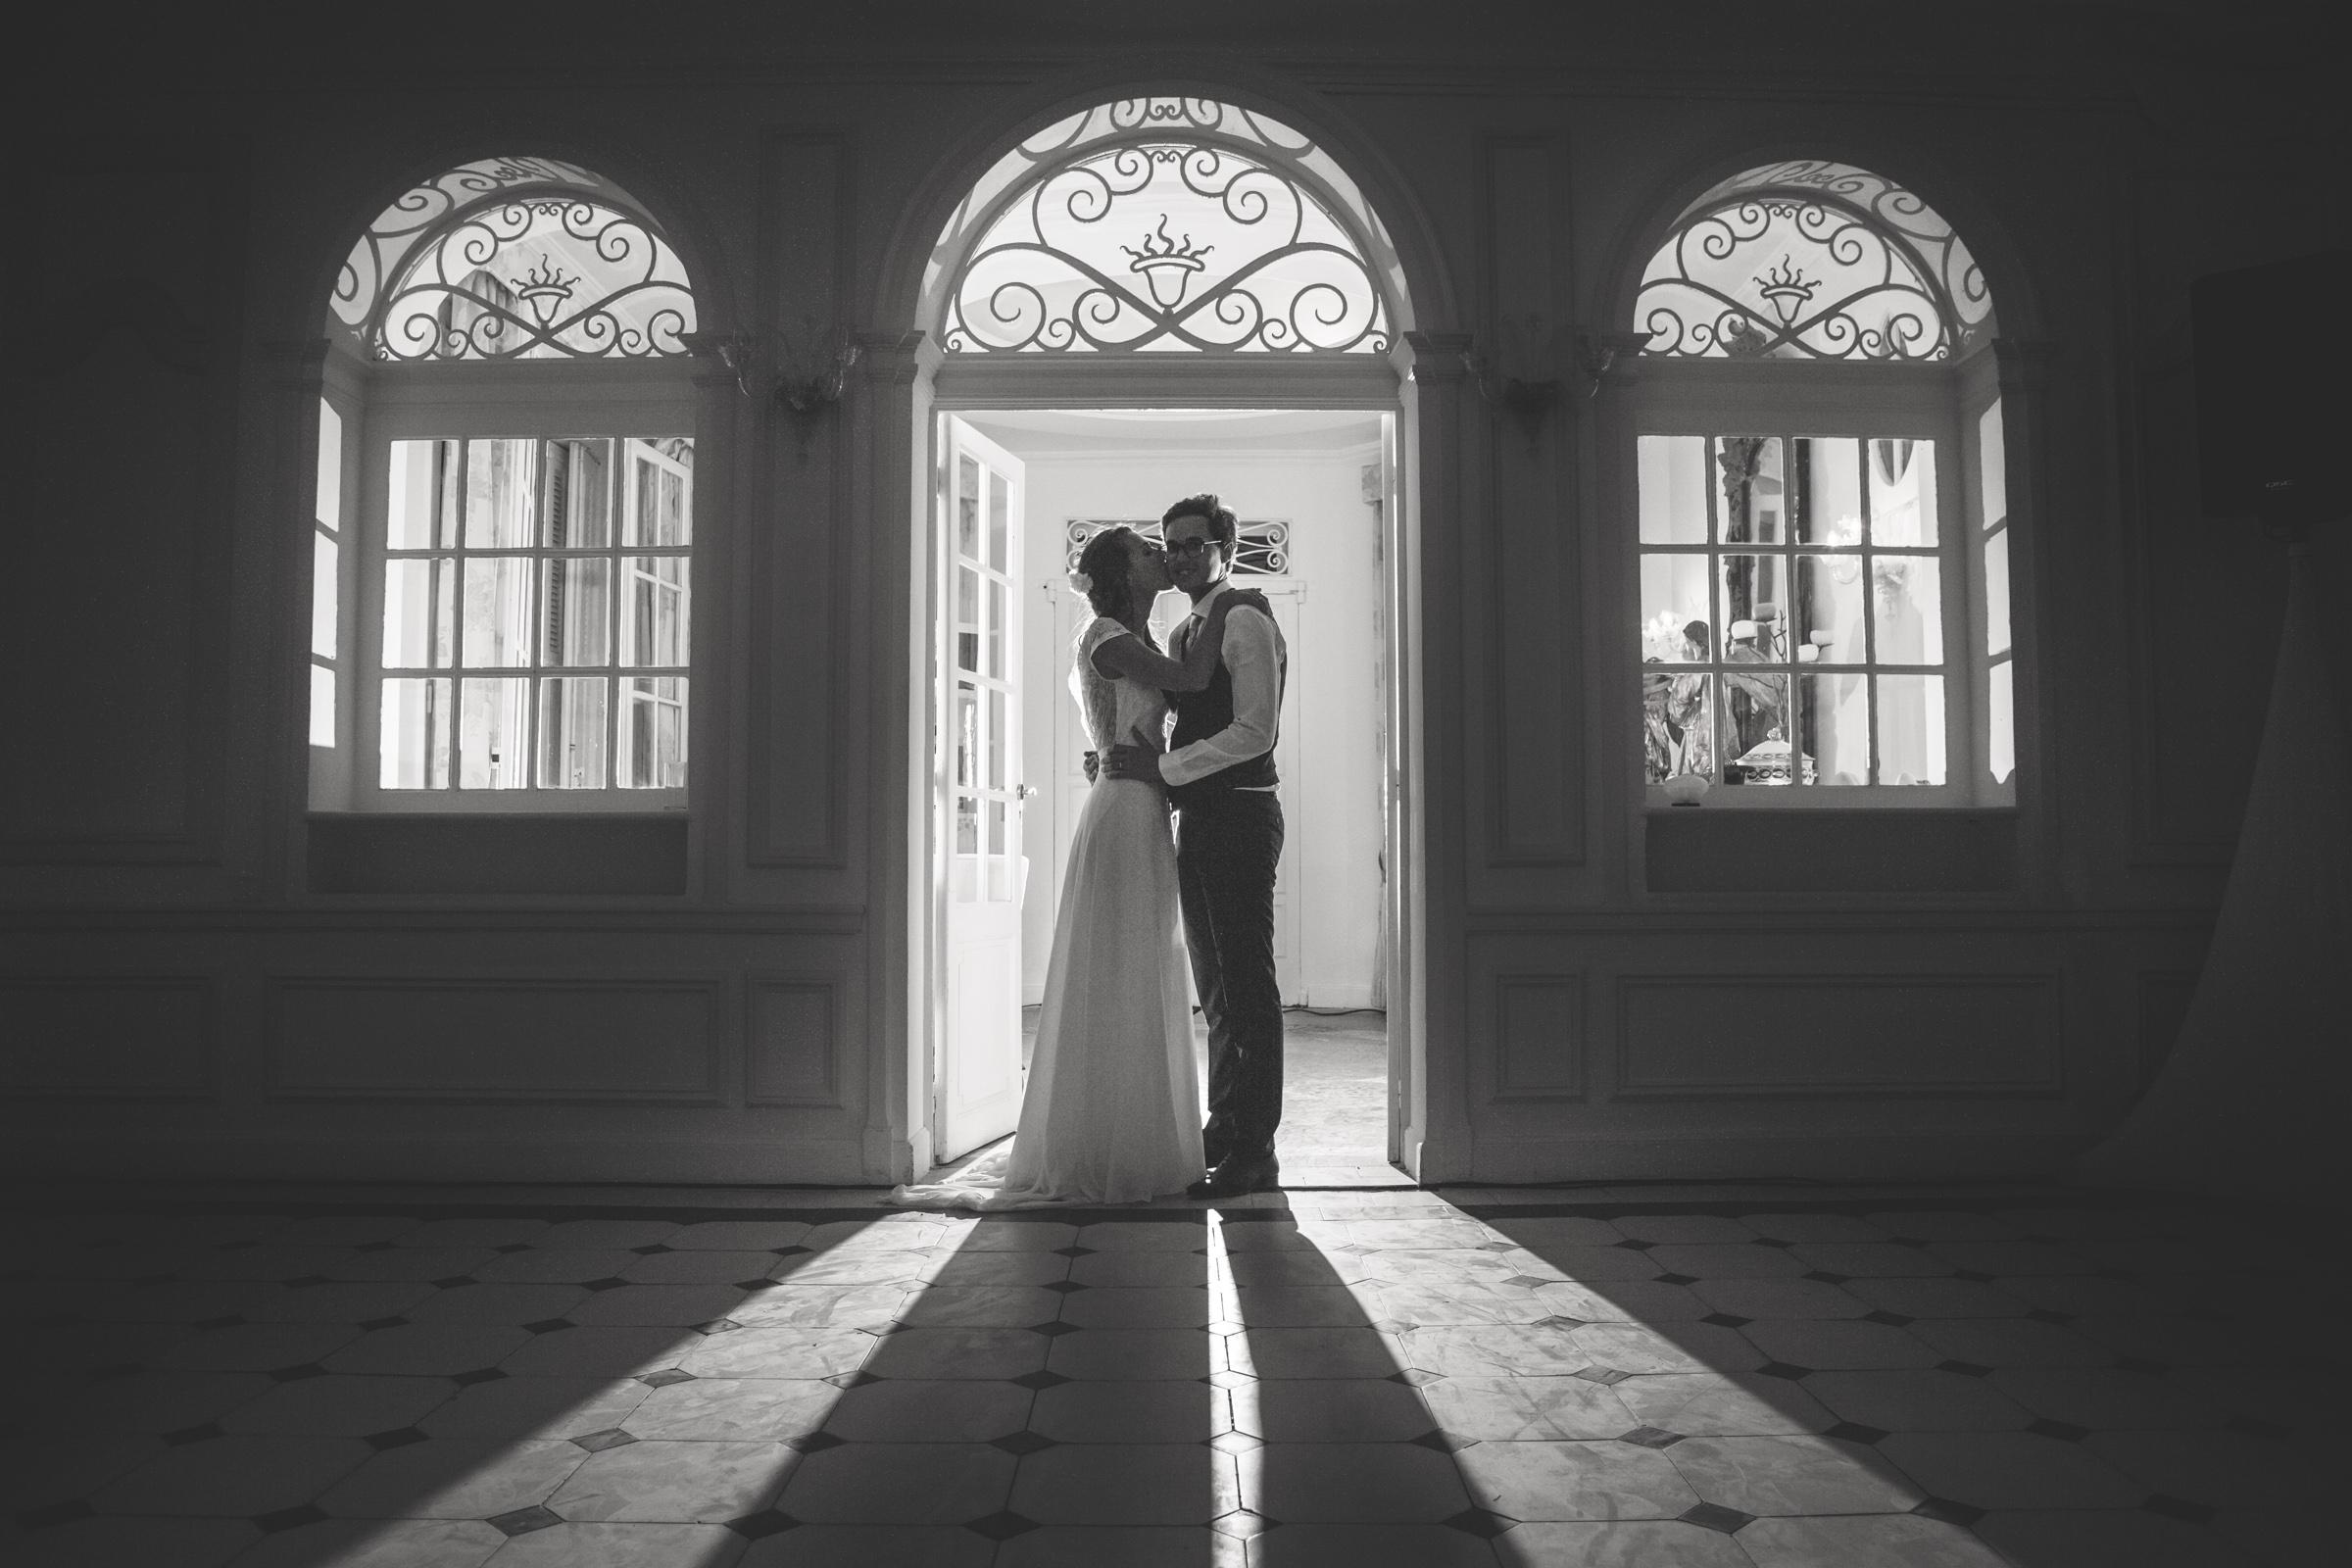 thomas+paulet+photographe+mariage+toulon+residence+cap+brun+photographe+photo de couple